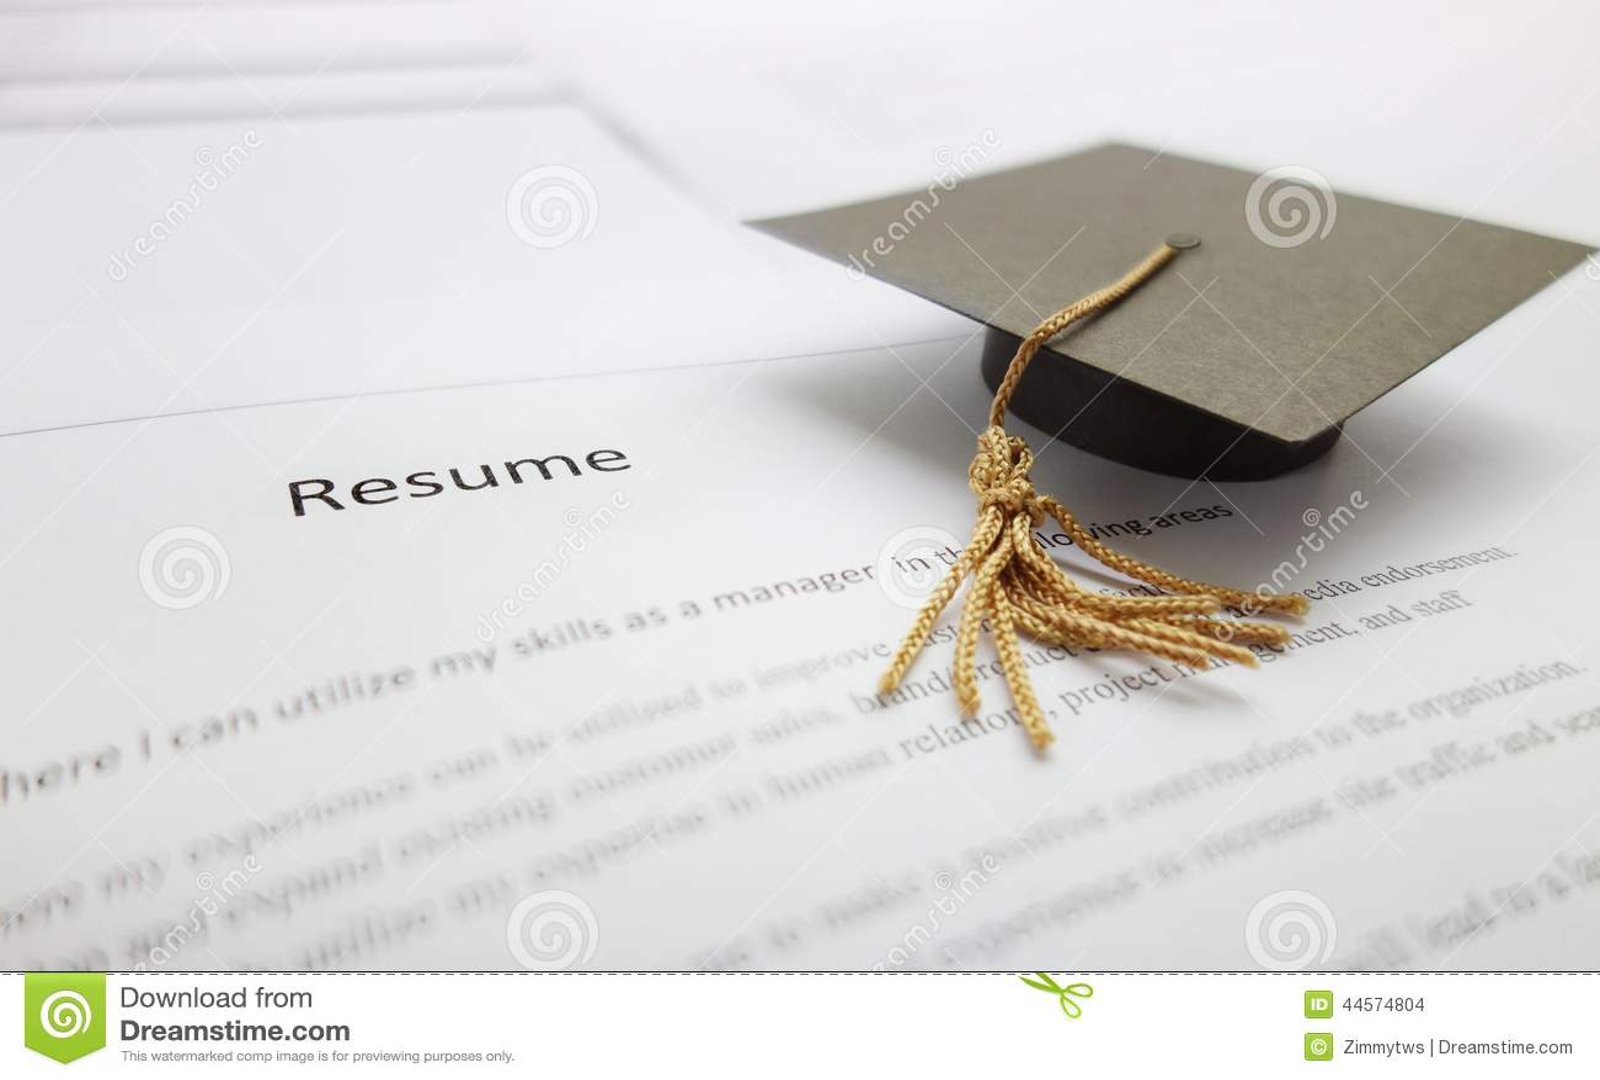 job resume stock photo image of graduation university 44574804. Black Bedroom Furniture Sets. Home Design Ideas